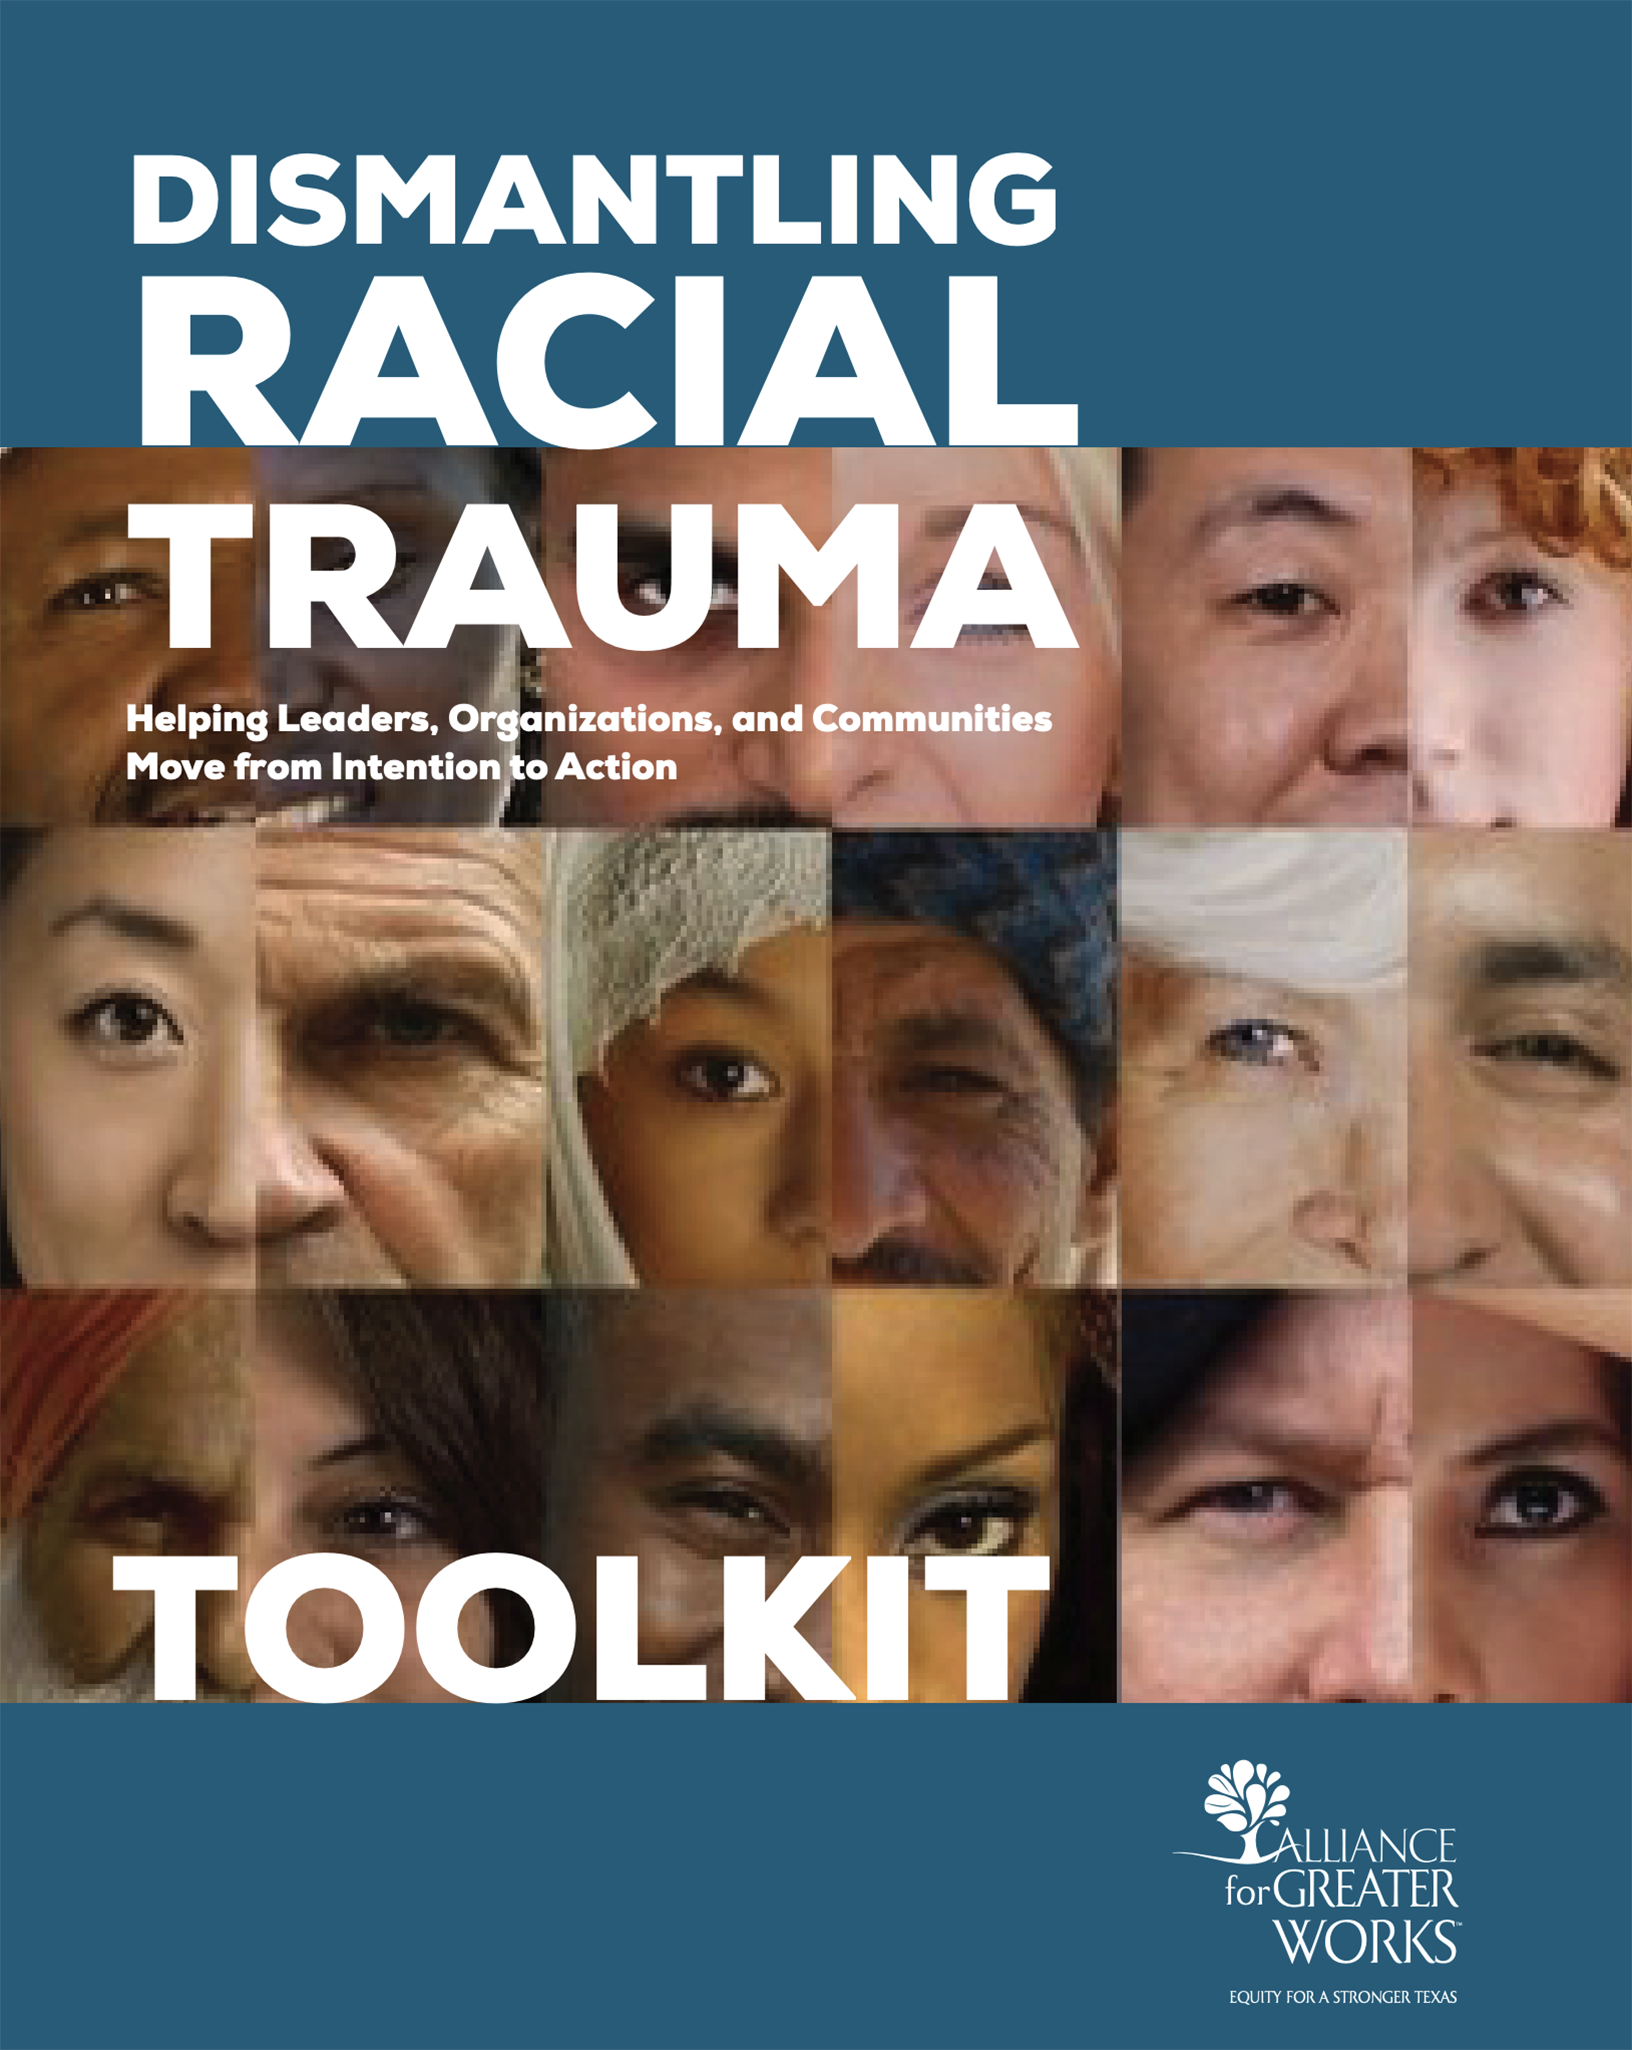 Dismantling Racial Trauma